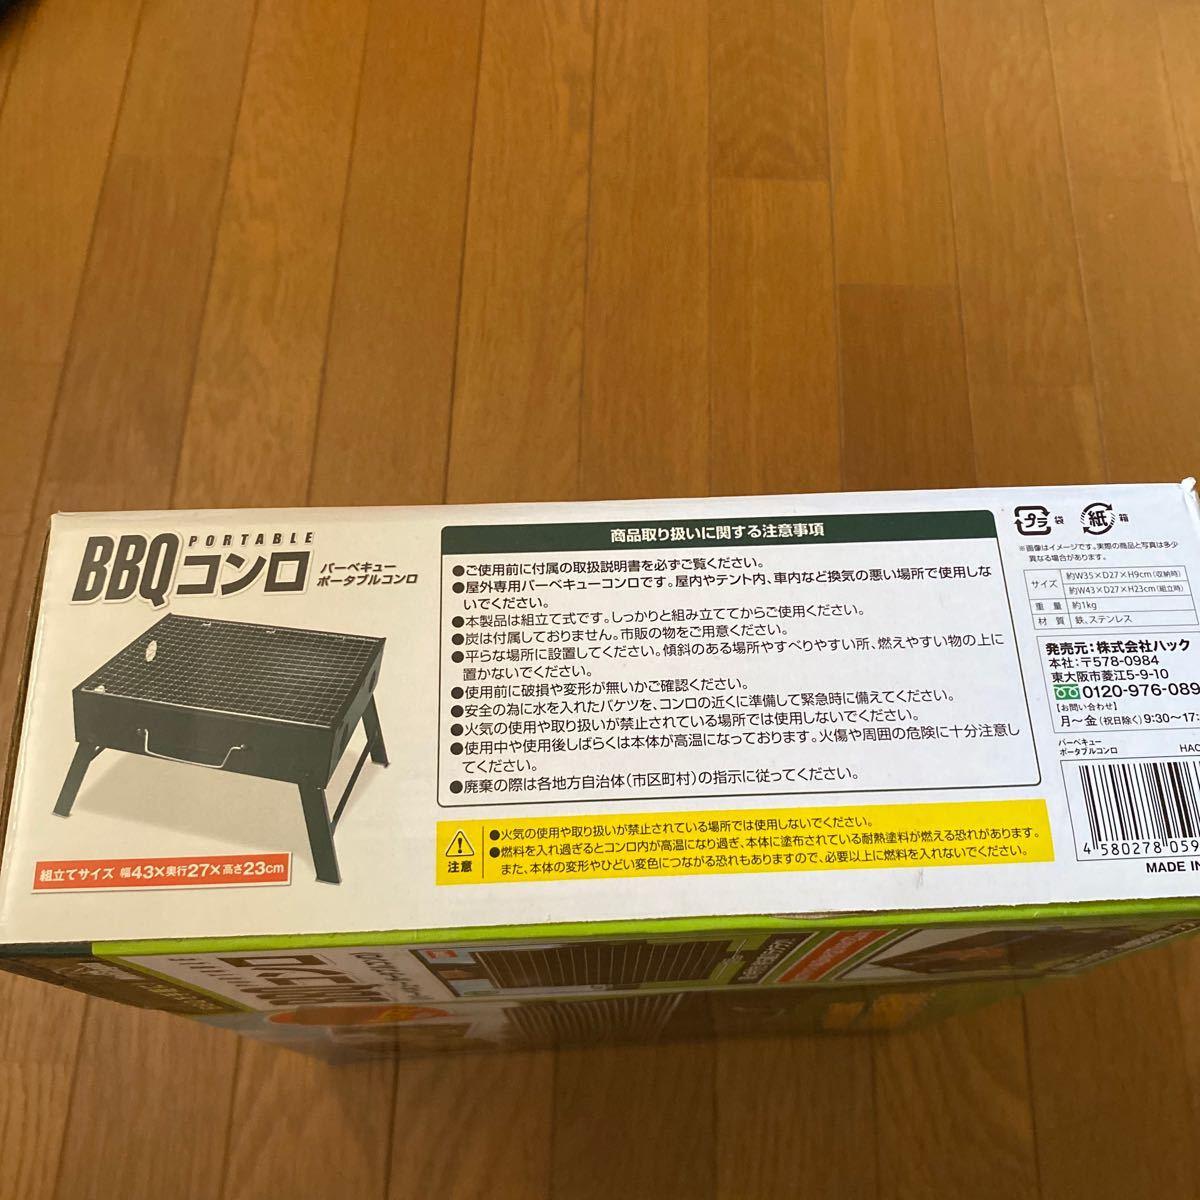 BBQ ポータブルコンロ